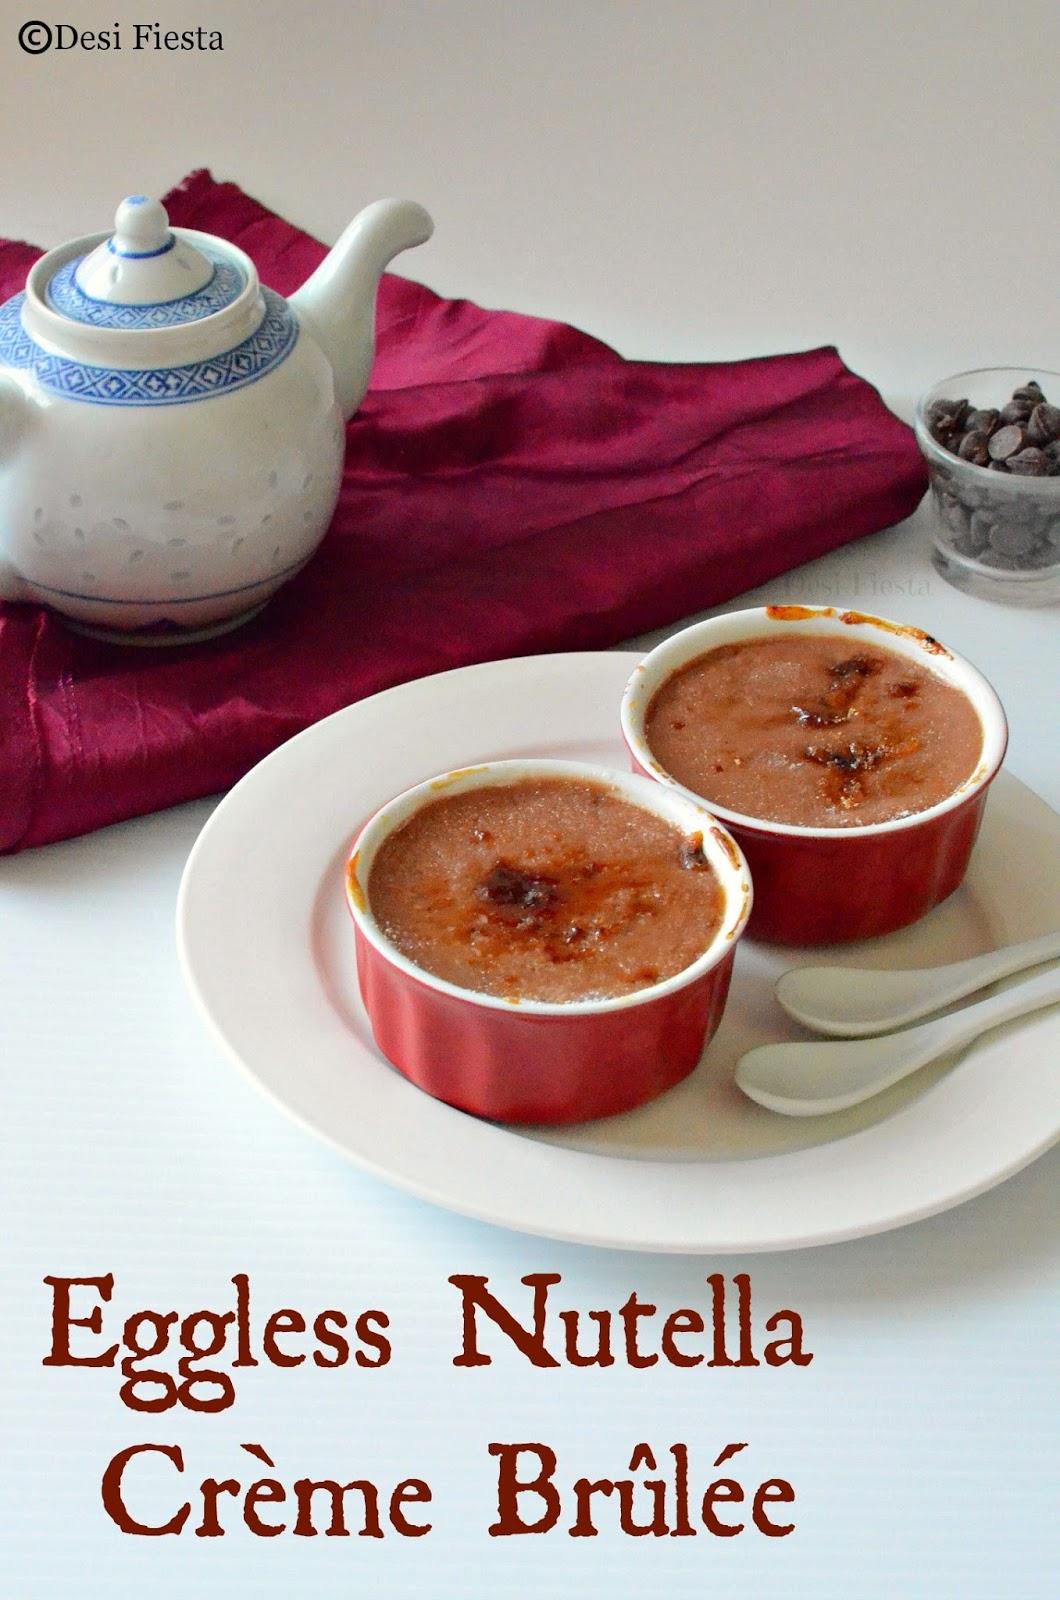 Creme Brulee - French dessert